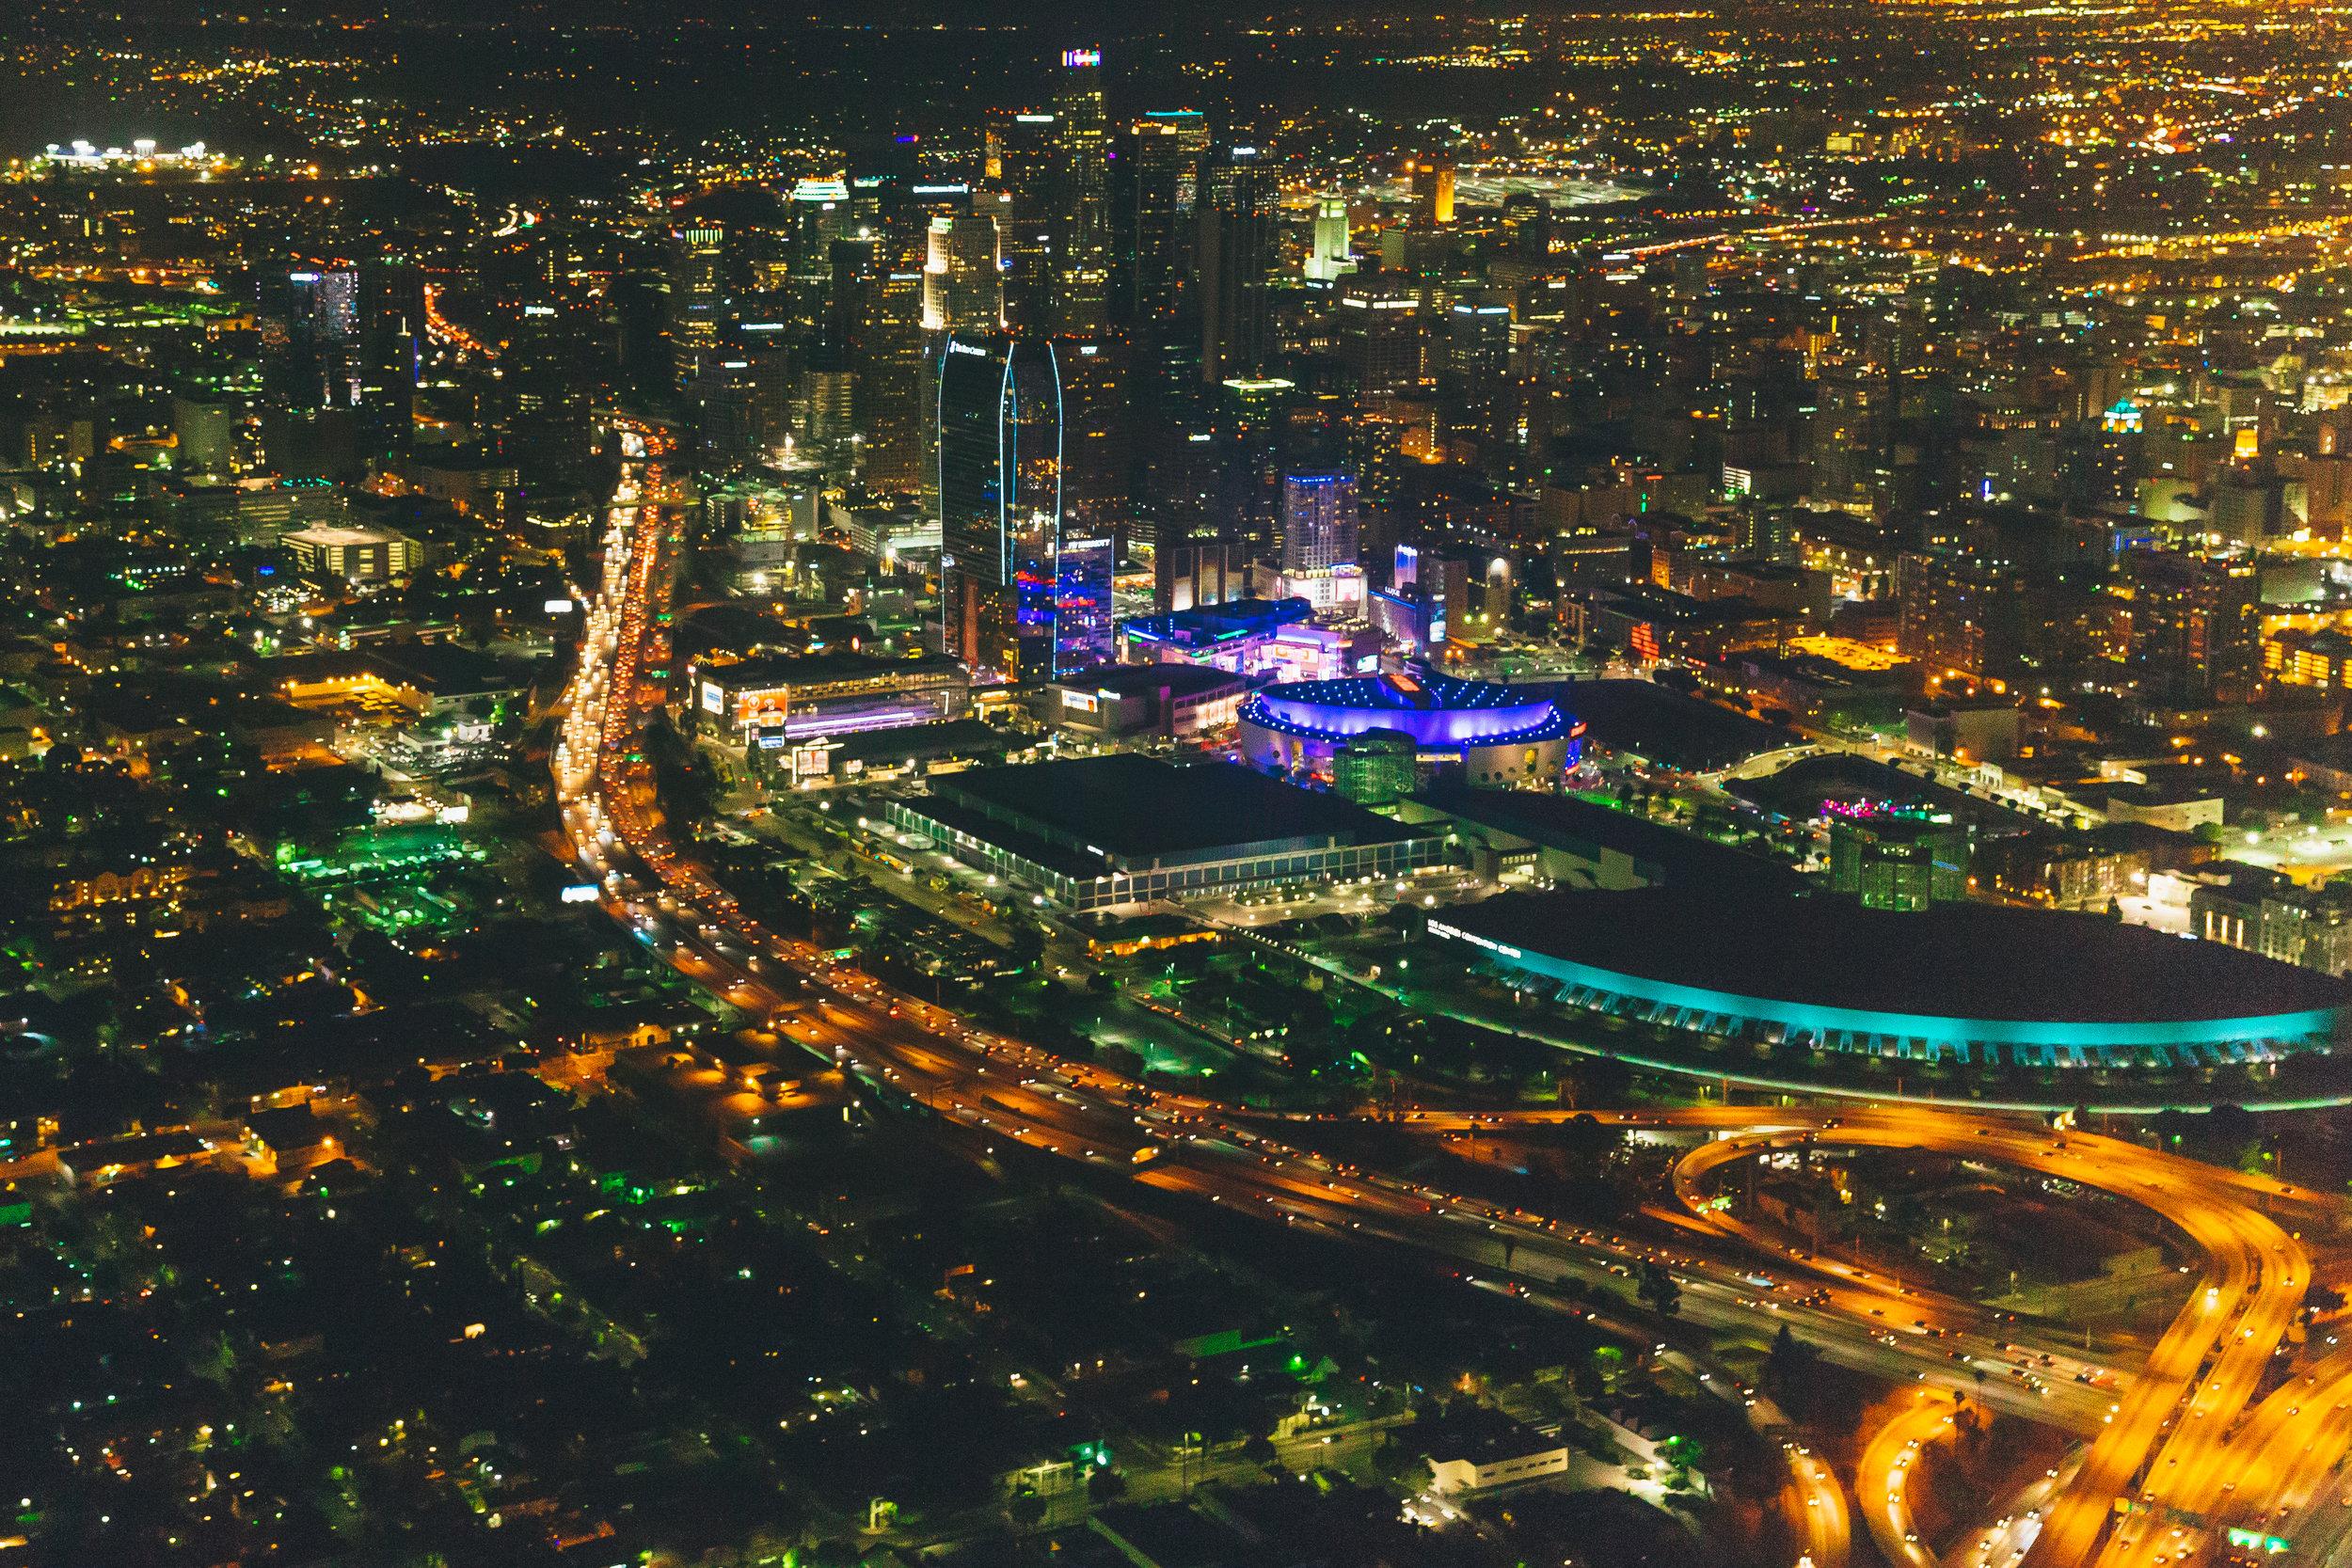 2015-LA-Aerial-017.jpg